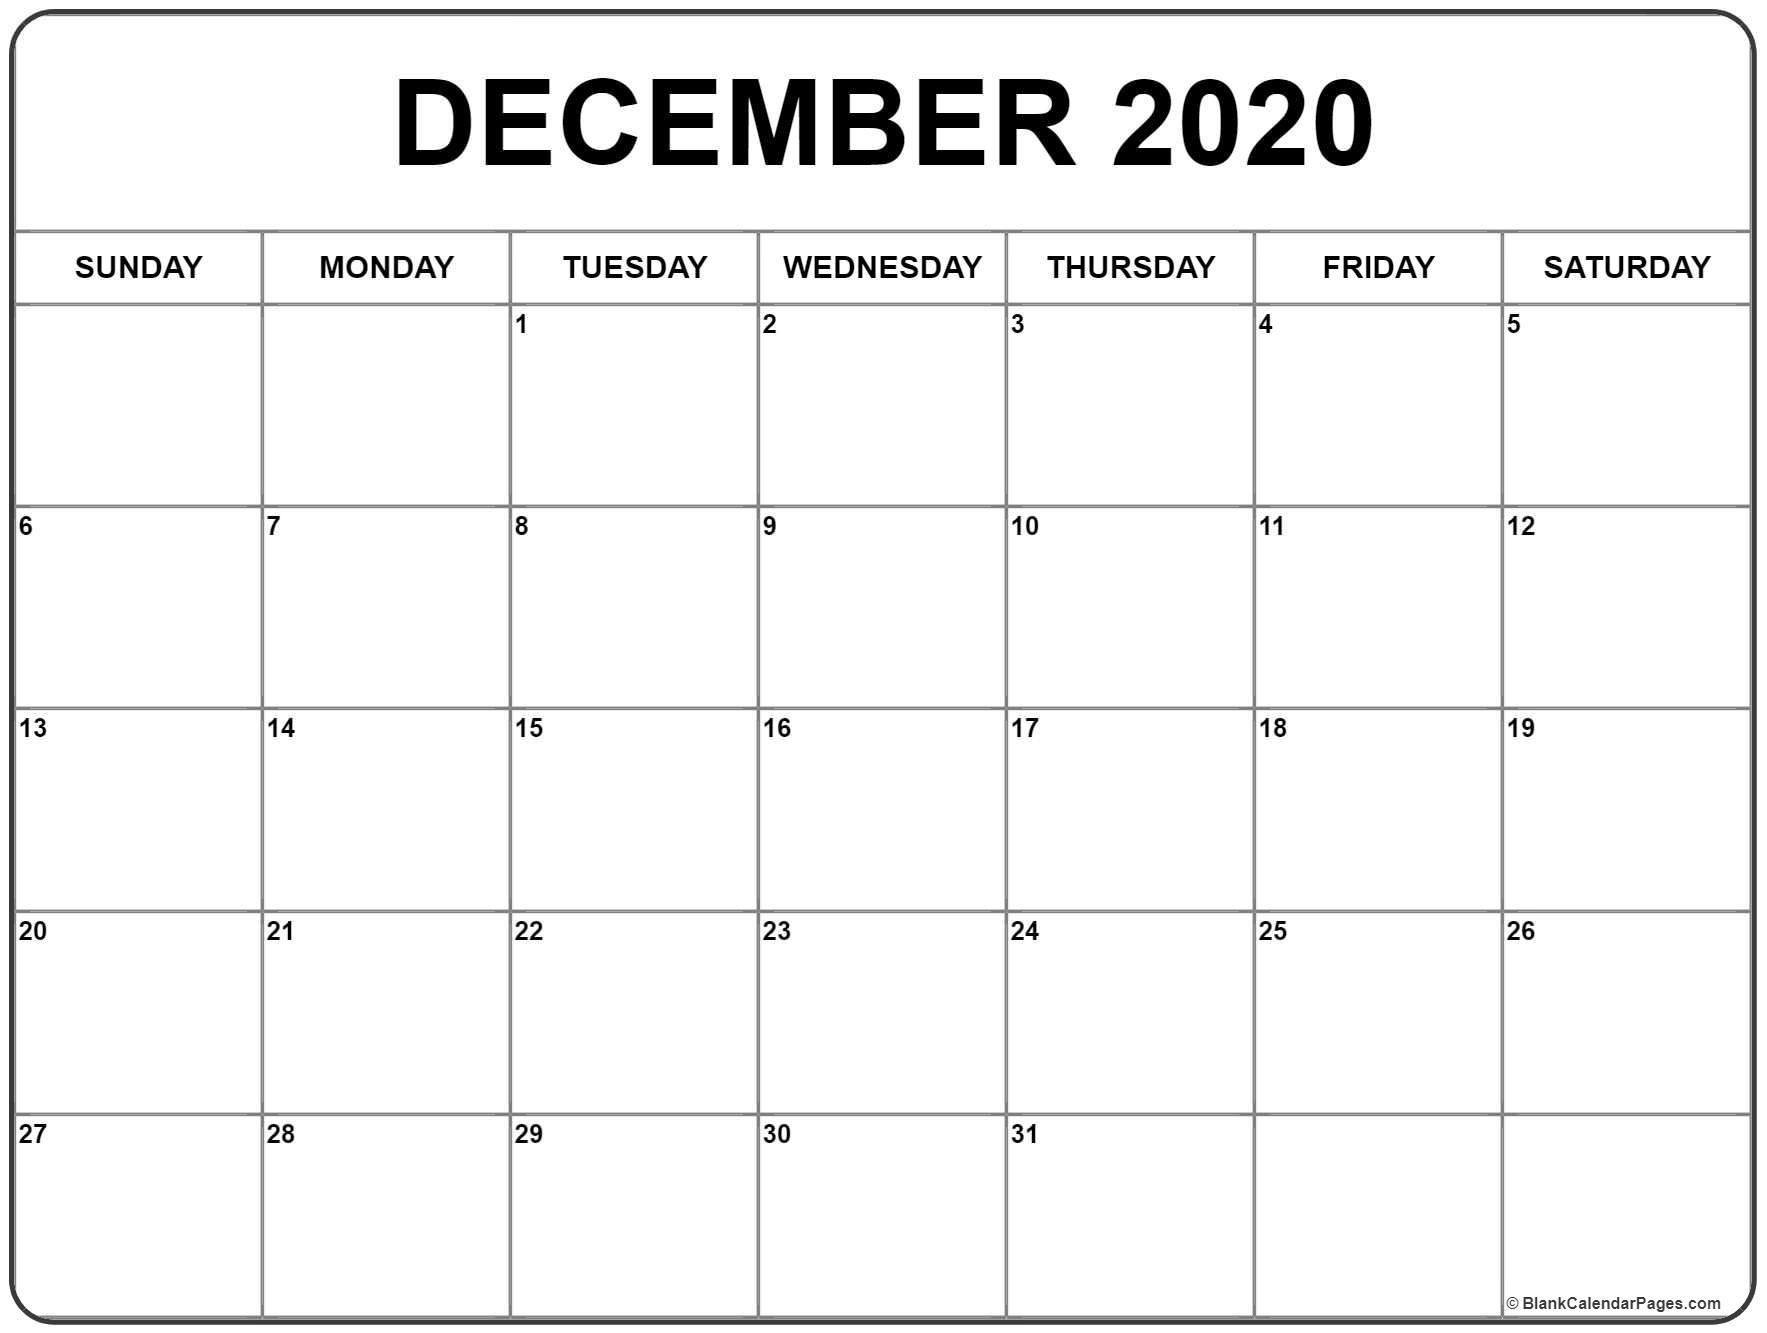 December 2020 Calendar   Free Printable Monthly Calendars-2020 August September Octobercalendar Monthly